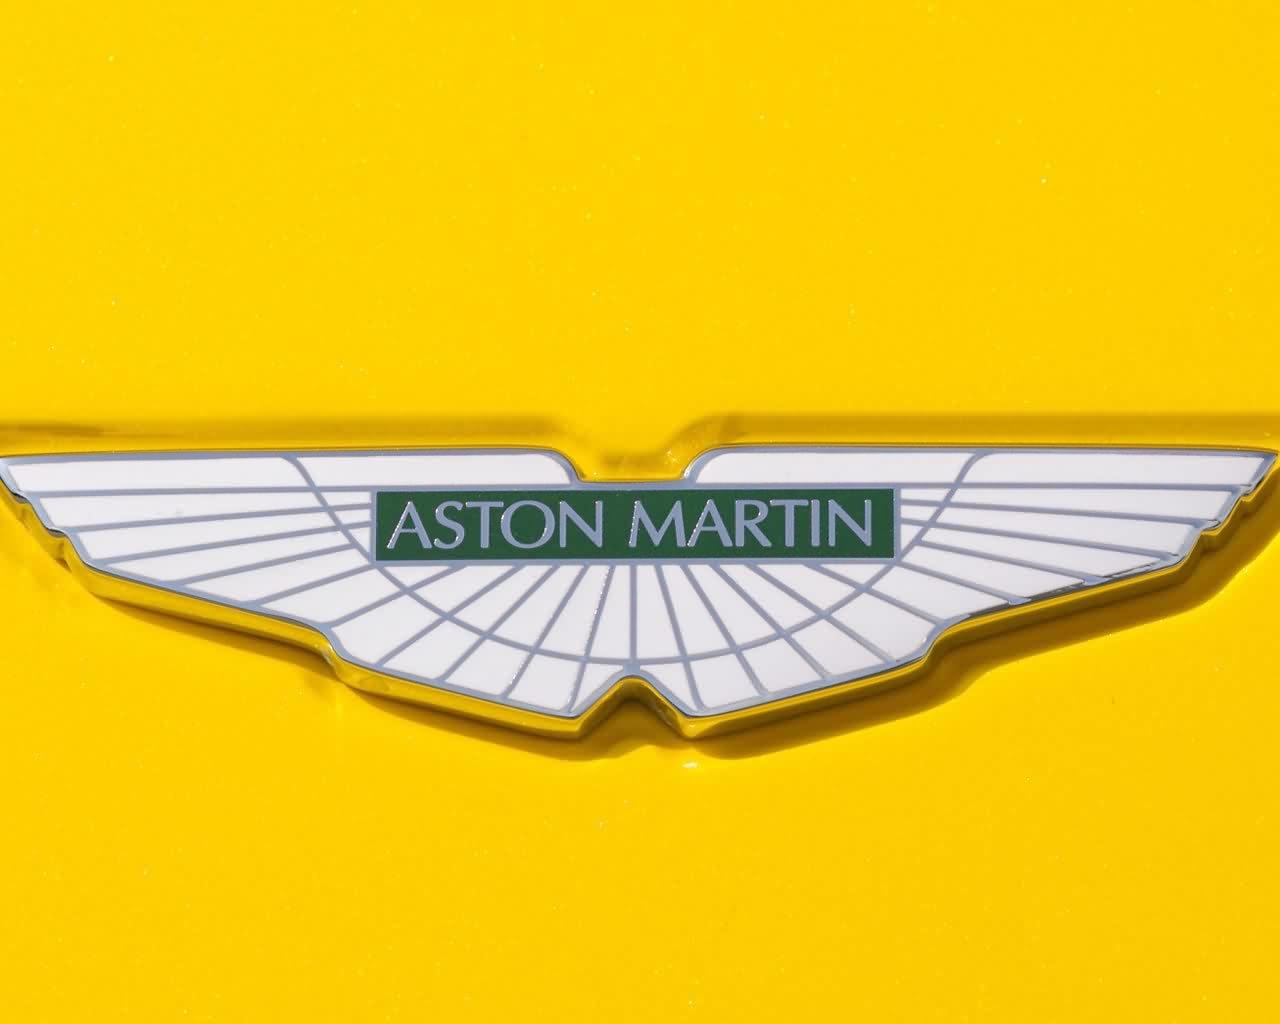 aston martin logo auto cars concept. Black Bedroom Furniture Sets. Home Design Ideas